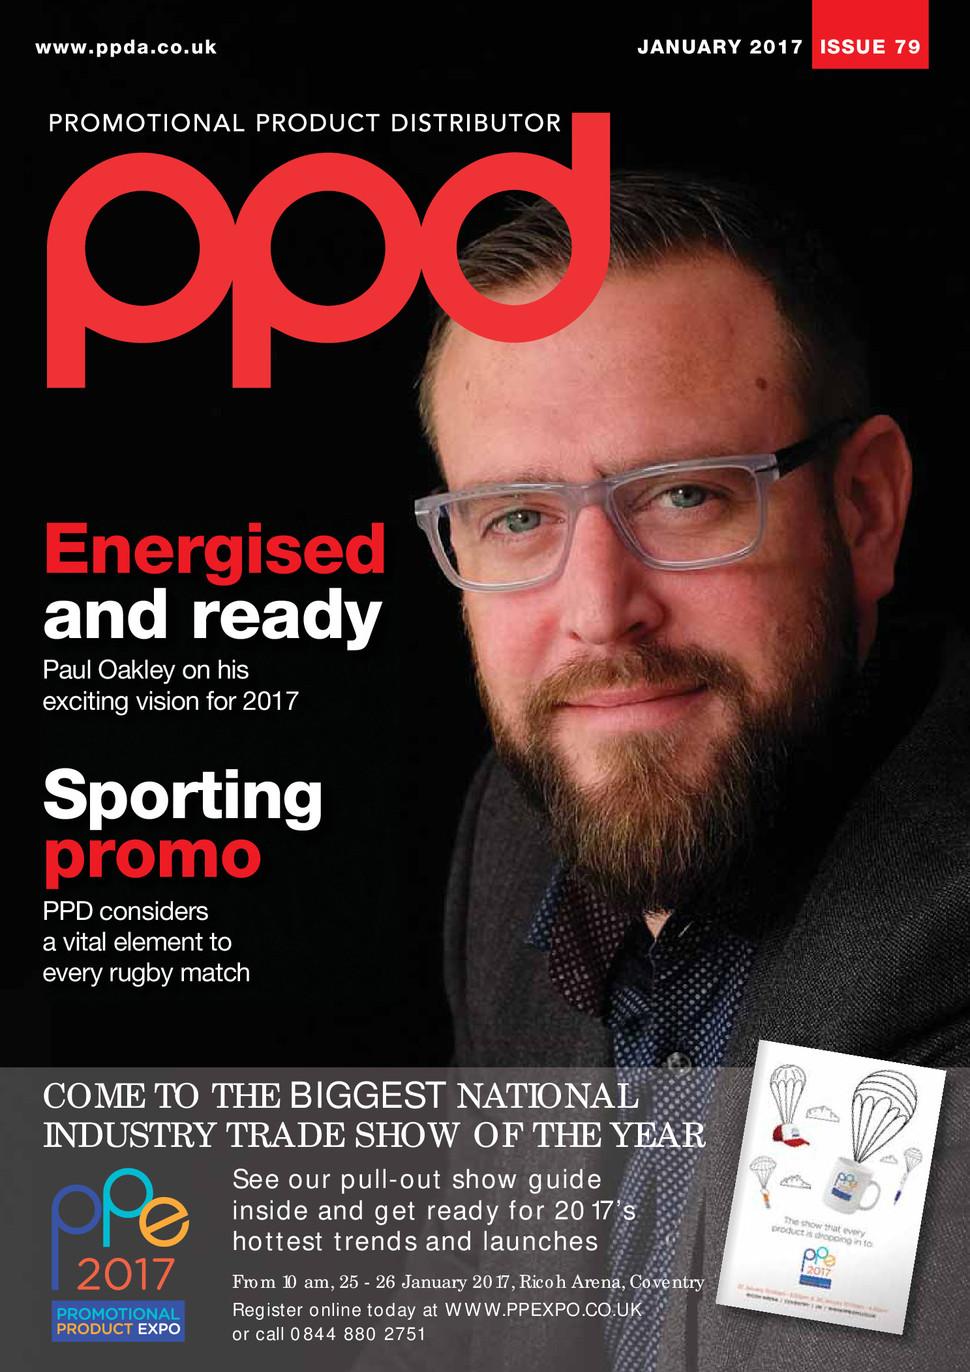 PPD Magazine - (Trade) Cover